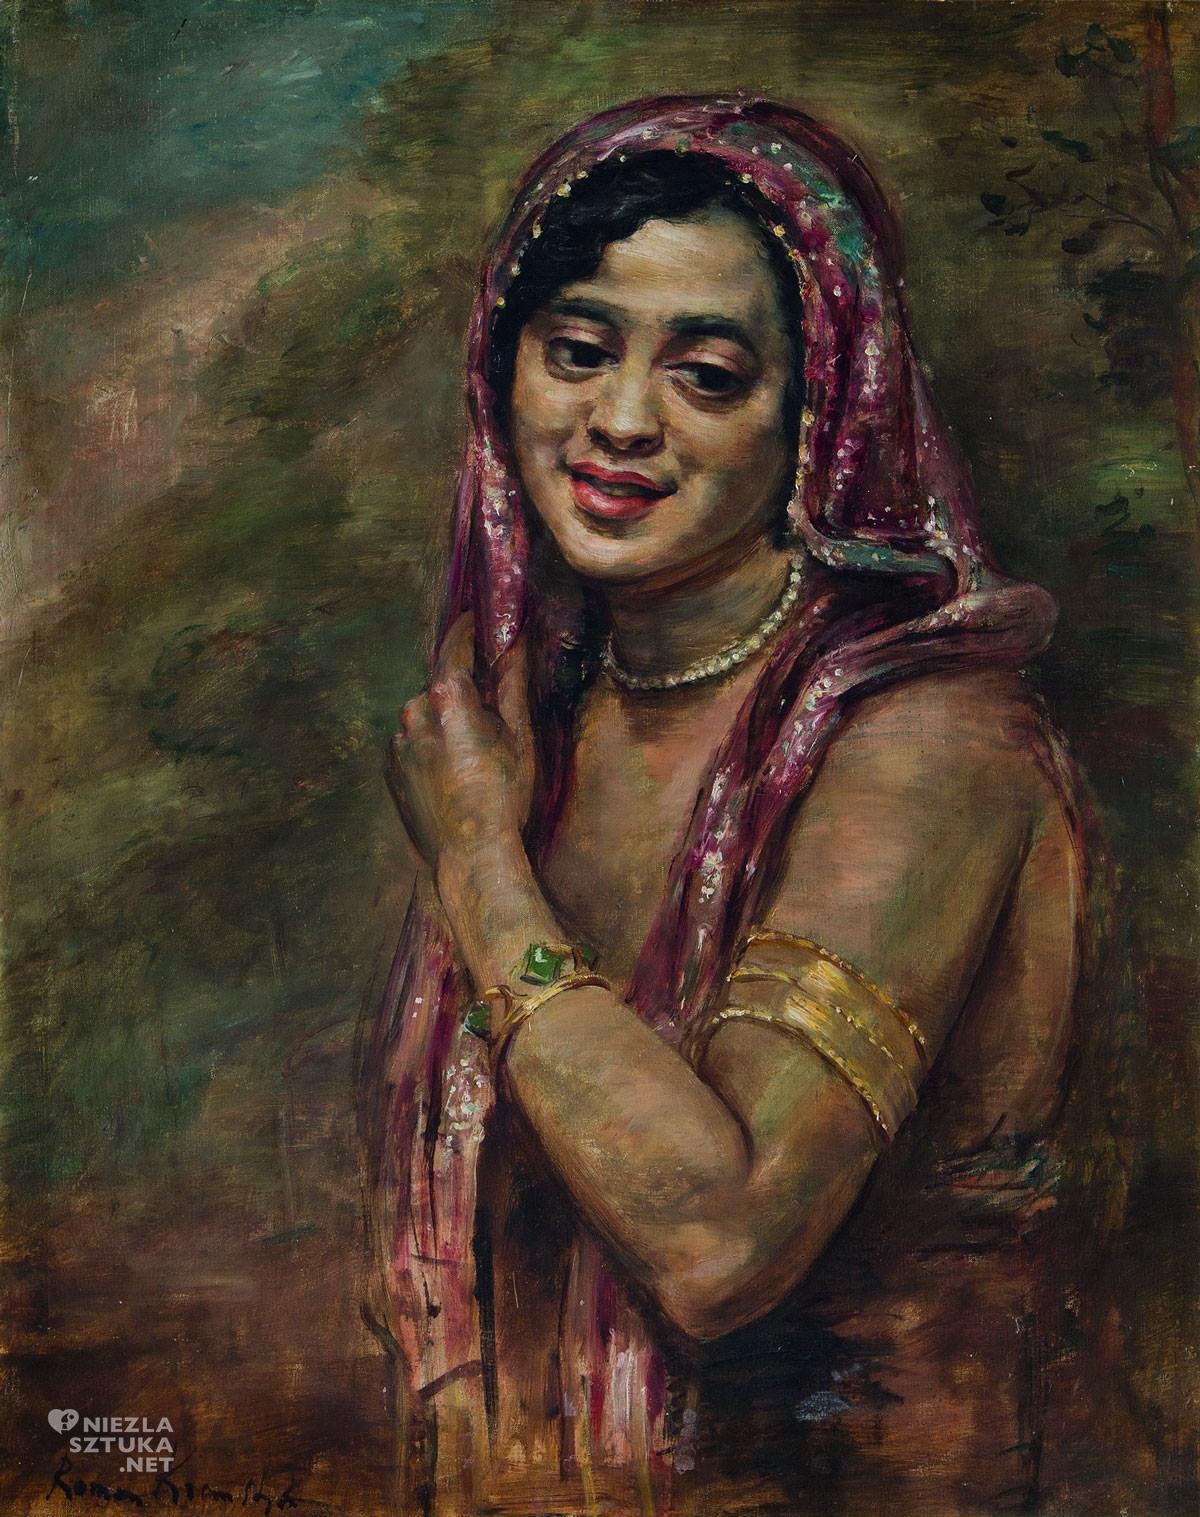 Roman Kramsztyk, Portret kobiety w chustce, Ecole de Paris, portret, sztuka polska, Niezła Sztuka